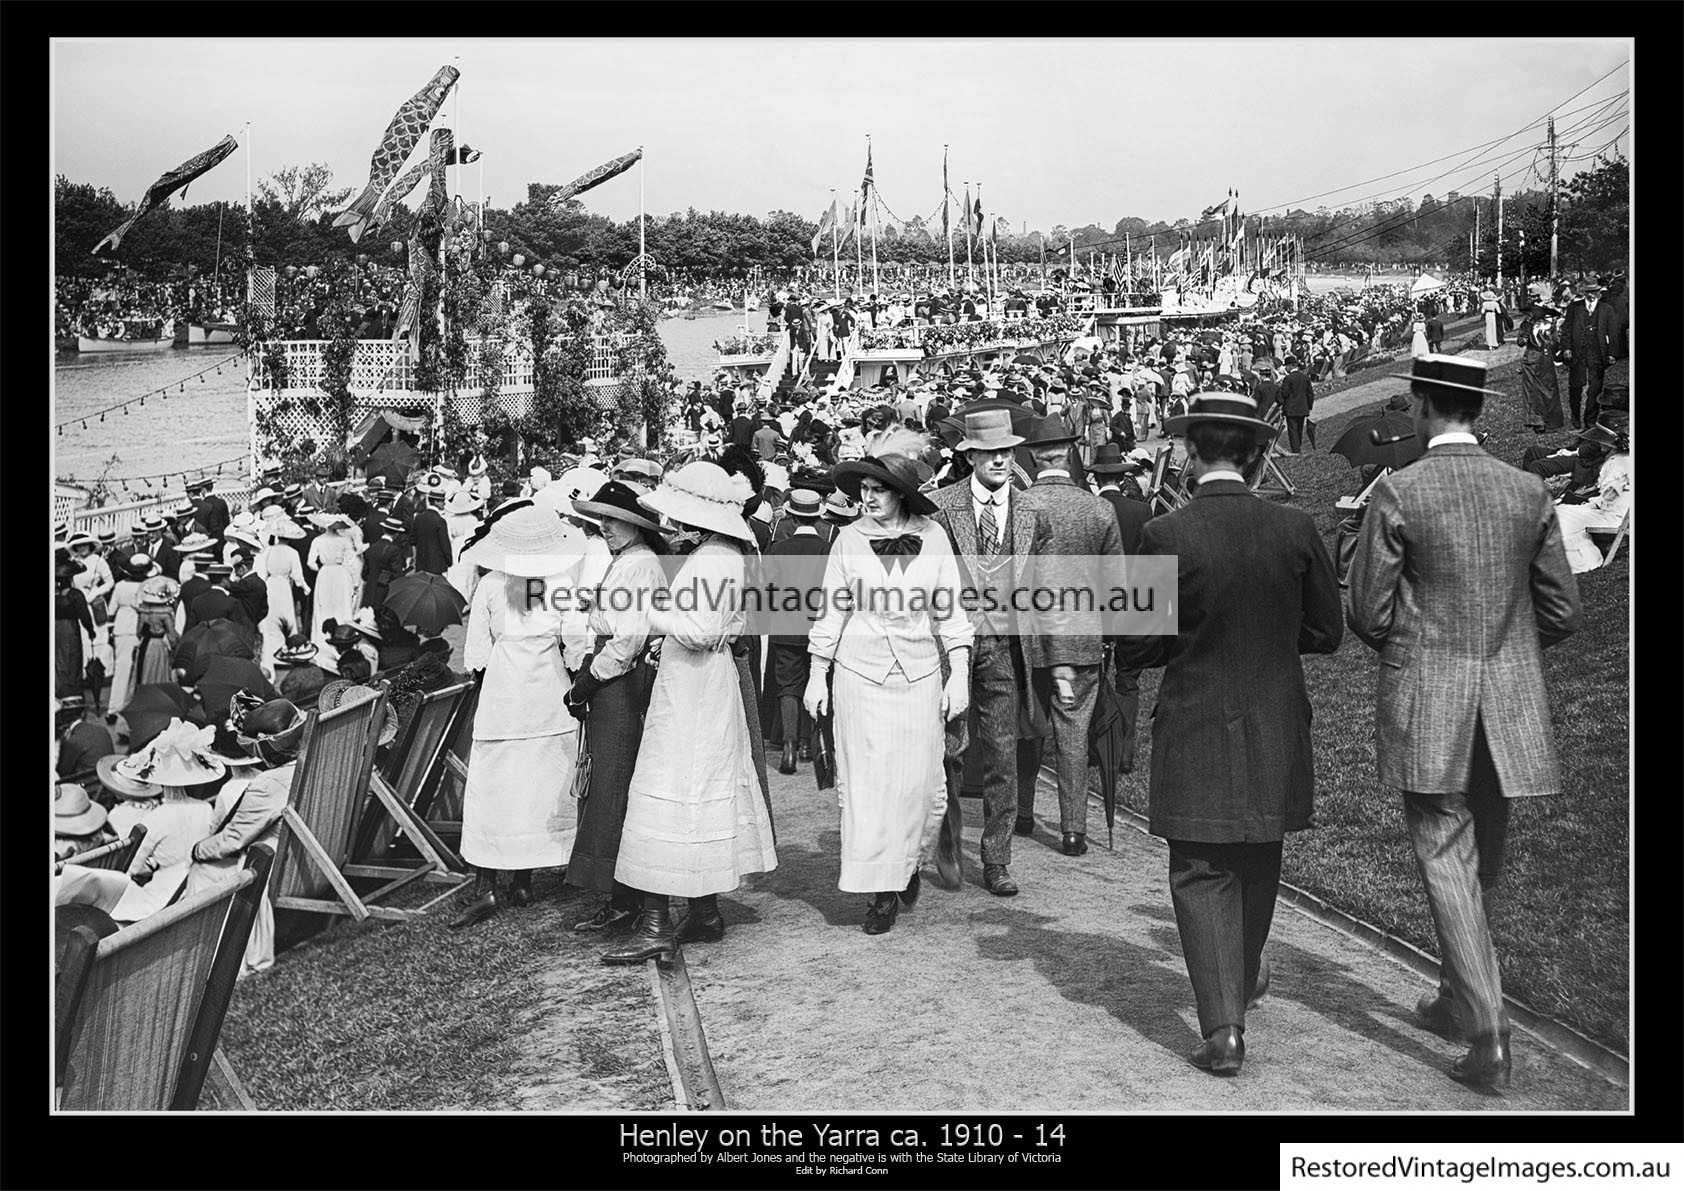 Henley On Yarra 1910 -14